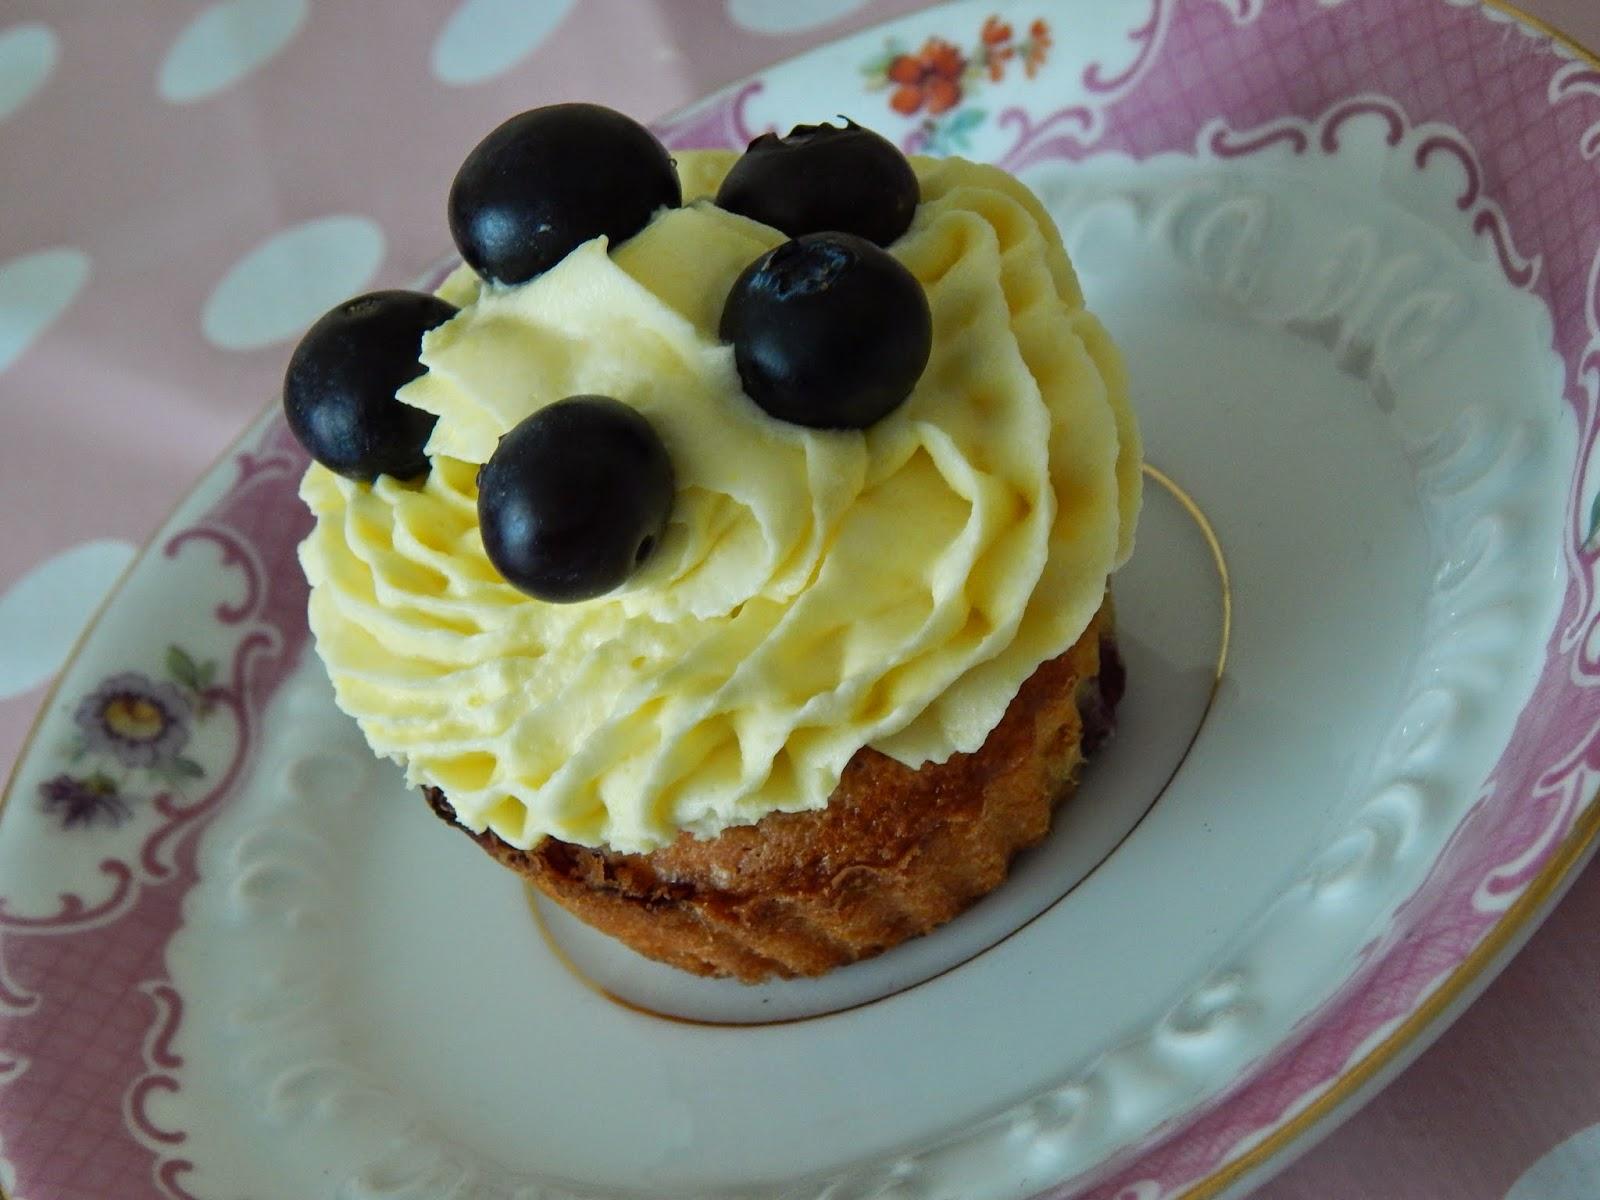 leylas leckereien blaubeer cupcakes mit vanille topping. Black Bedroom Furniture Sets. Home Design Ideas